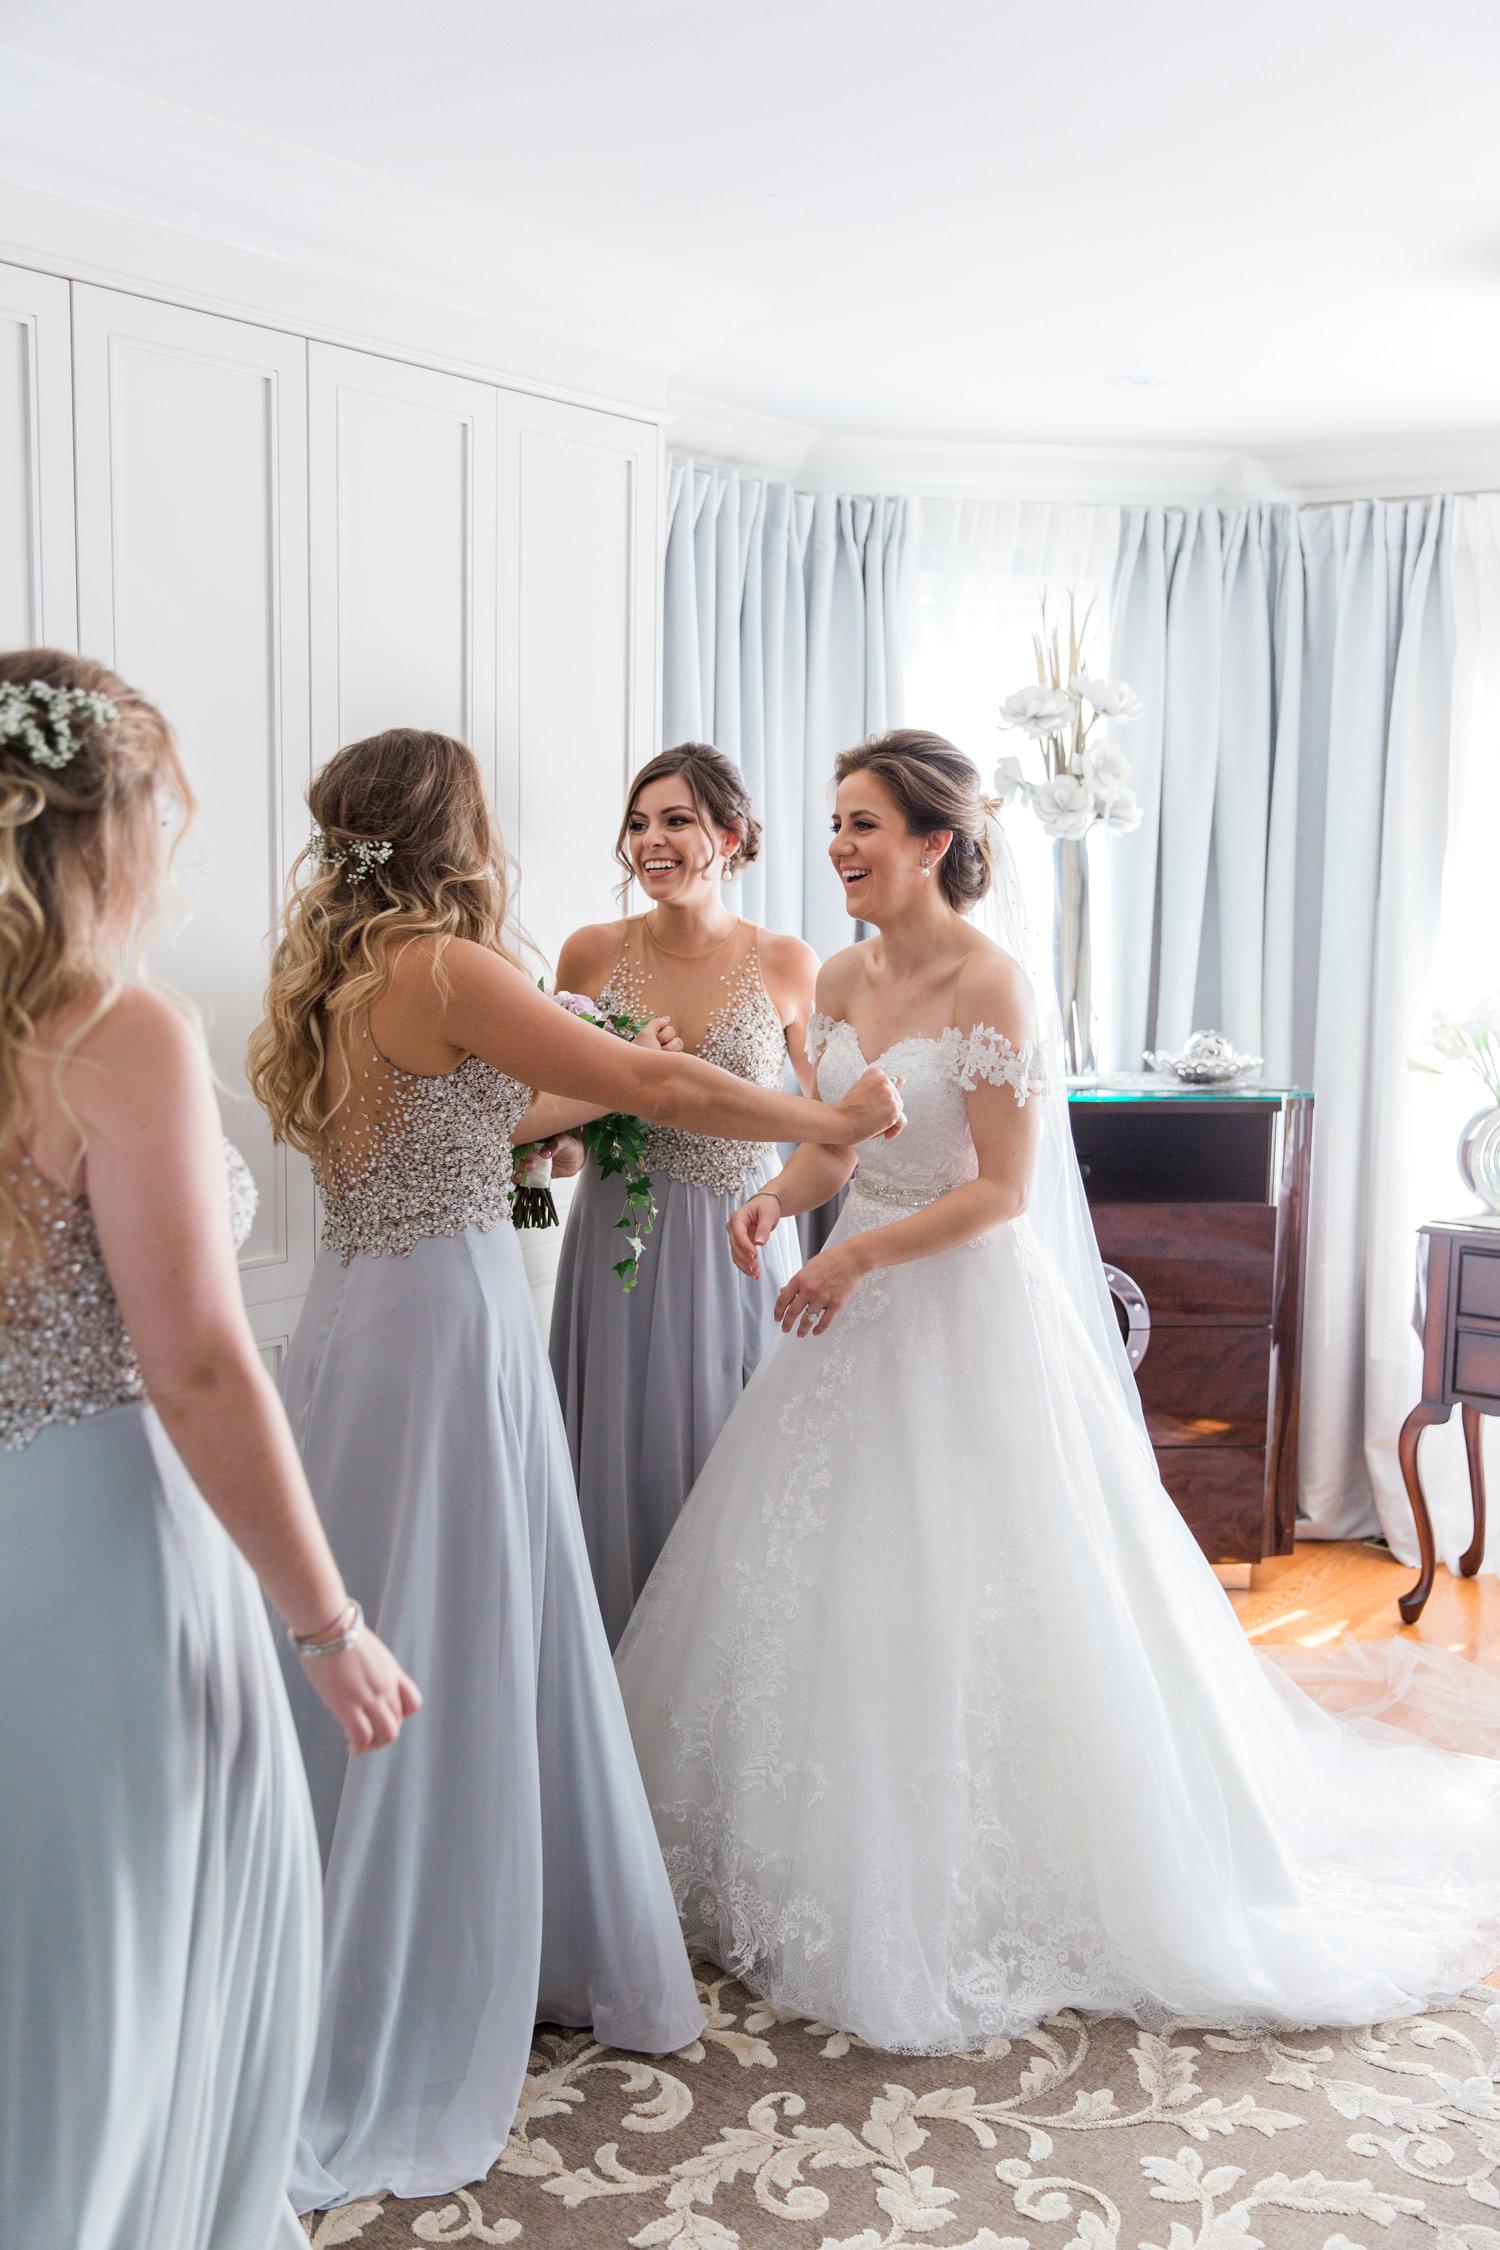 Danielle-Giroux-Amir-Golbazi-Toronto-Wedding-Photographer-Bellvue-Manor_DeLuca_1-155.jpg